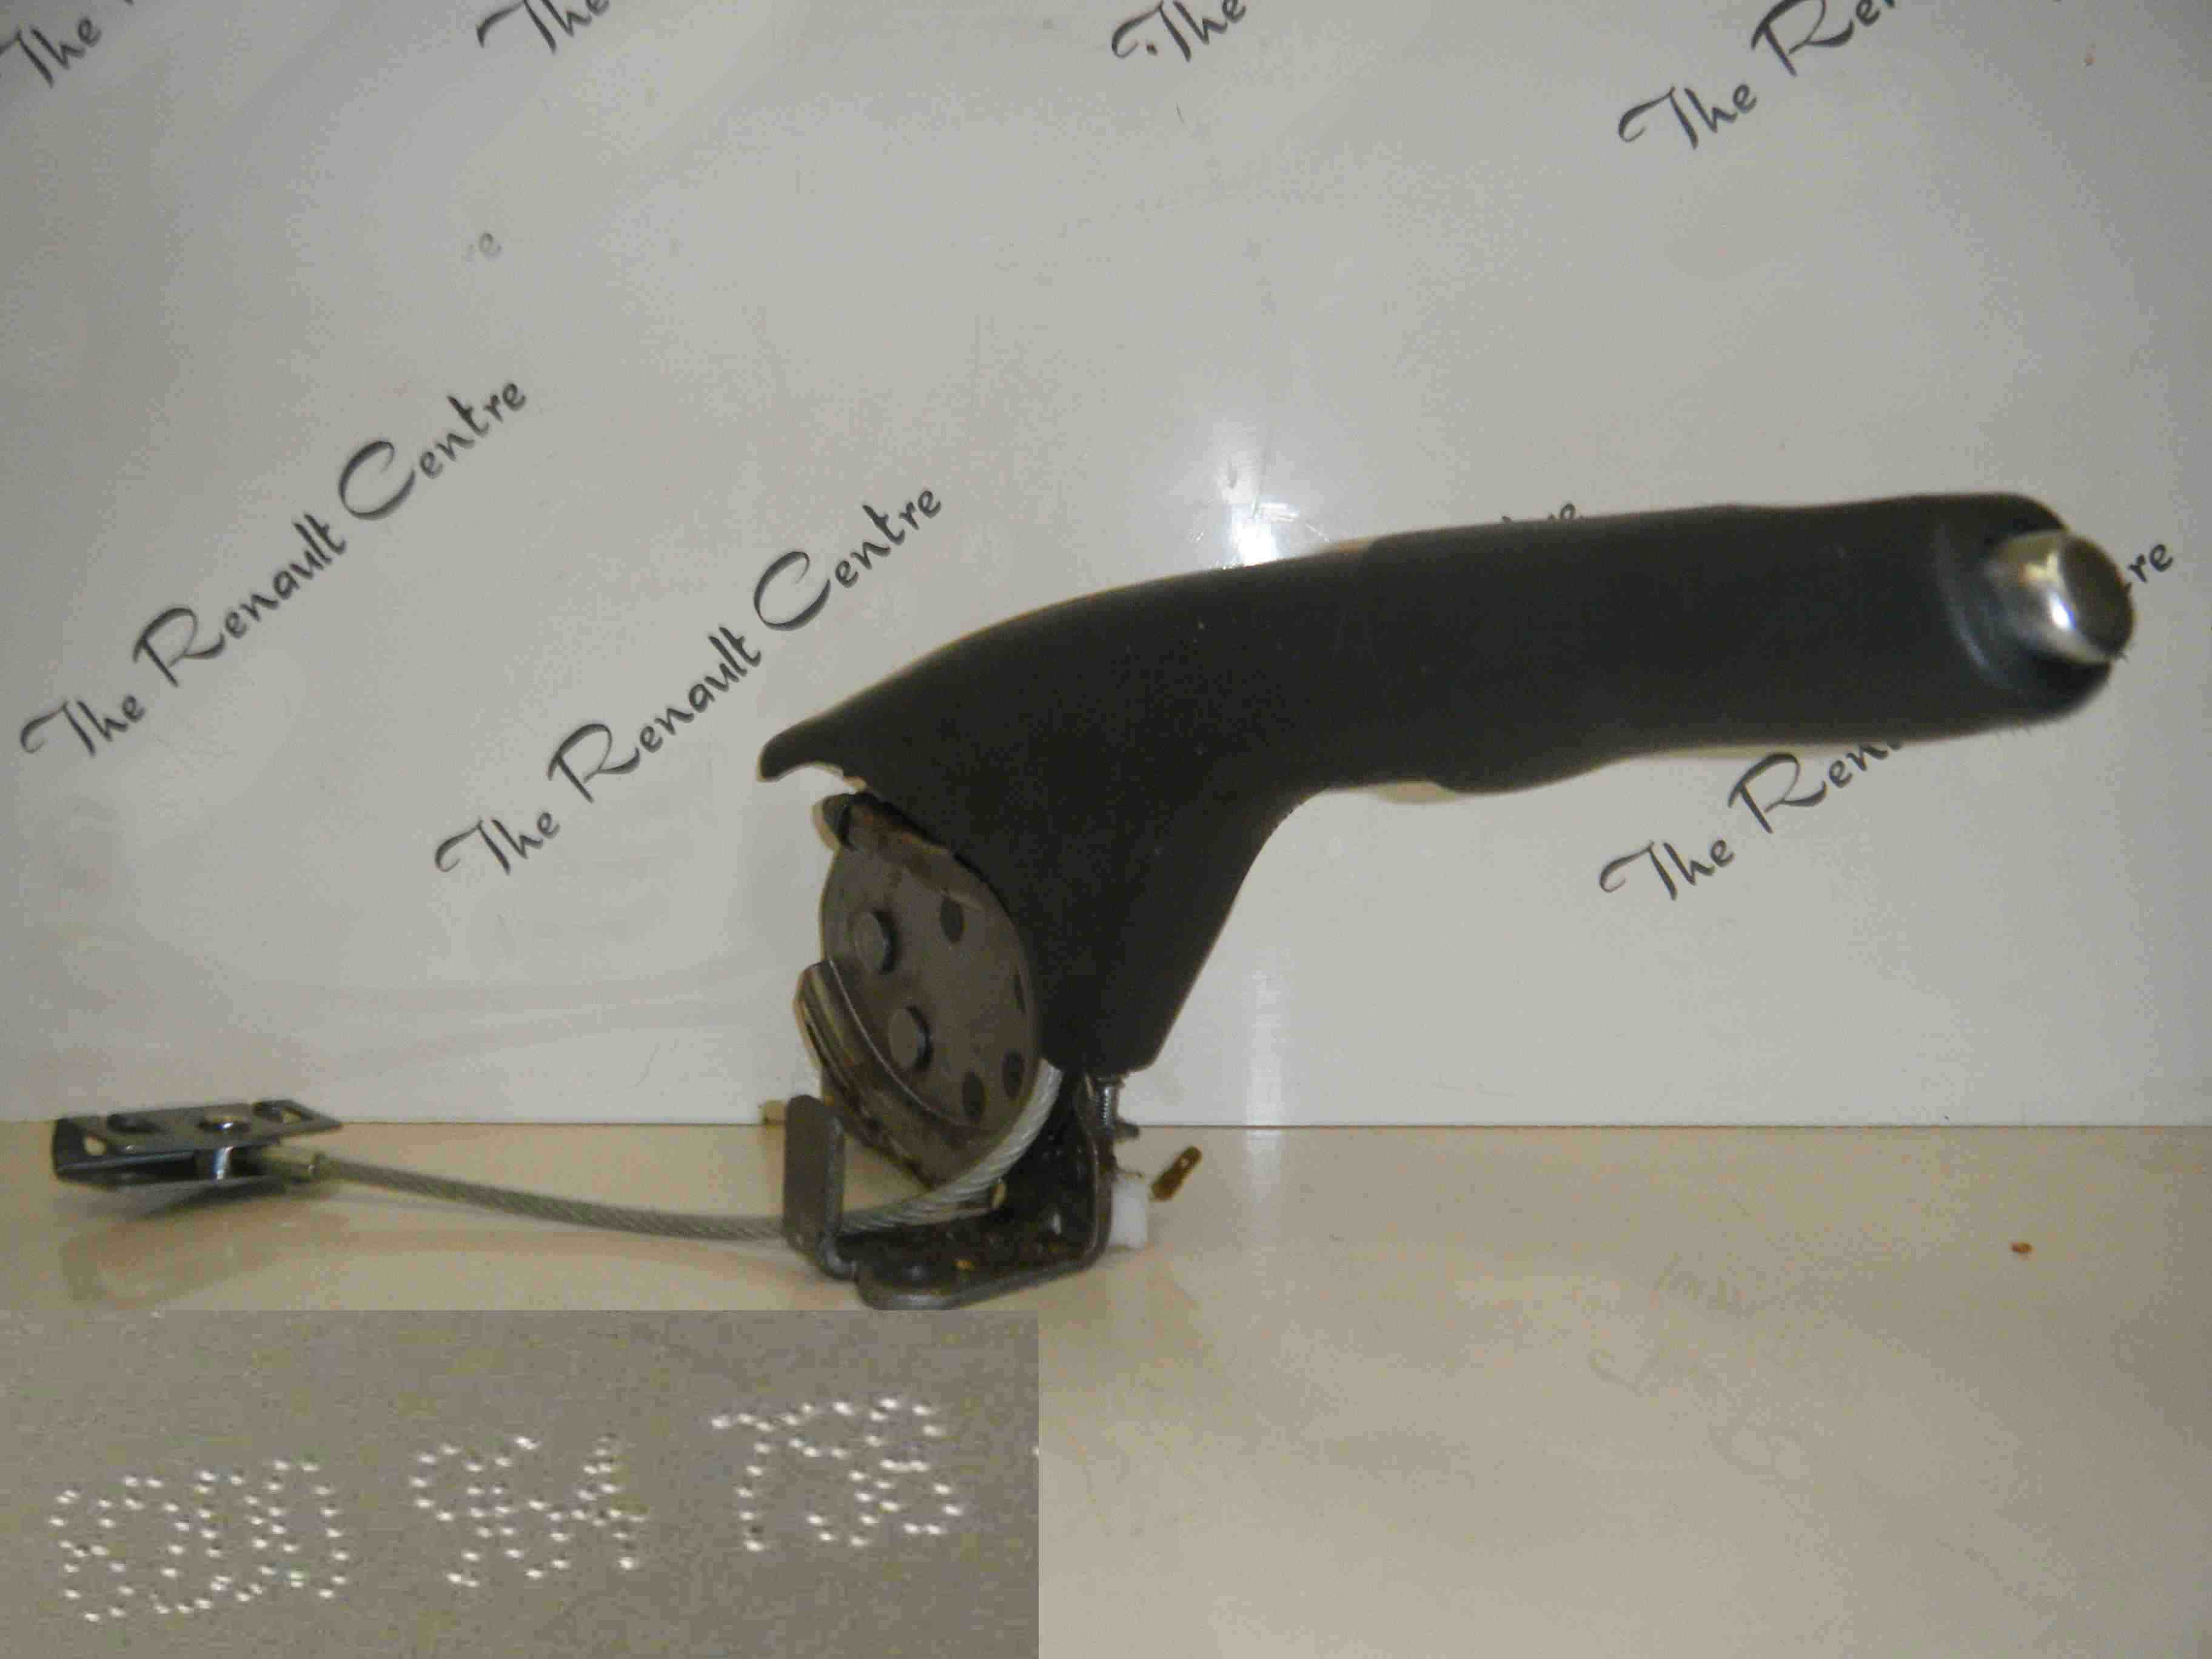 Renault Clio MK3 2005-2012 Handbrake Parking Mechanism Ratchet